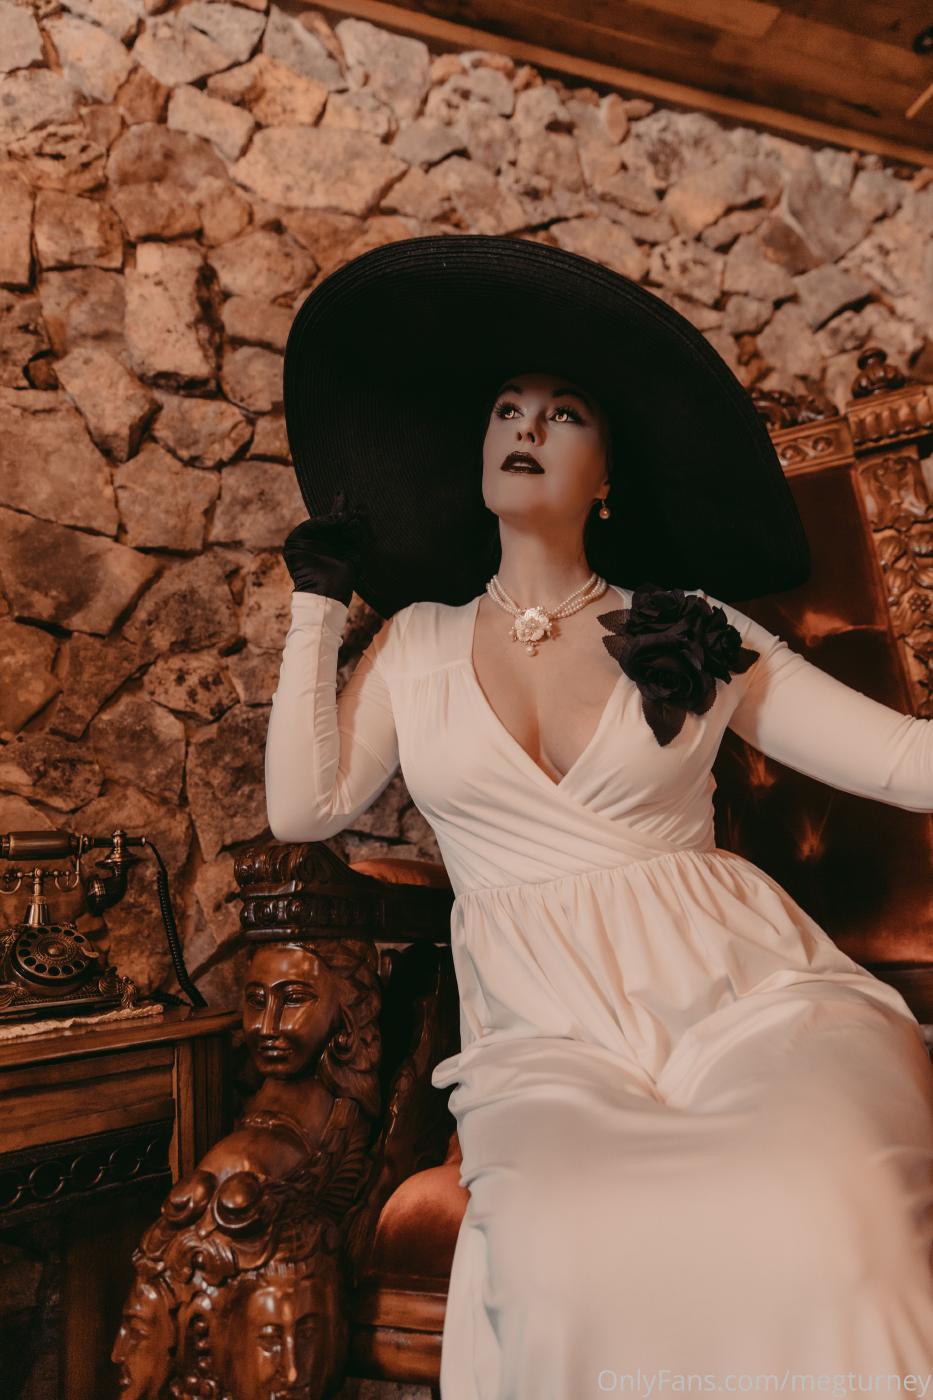 Meg Turney Lady Dimitrescu Cosplay Onlyfans Set Leaked 0042